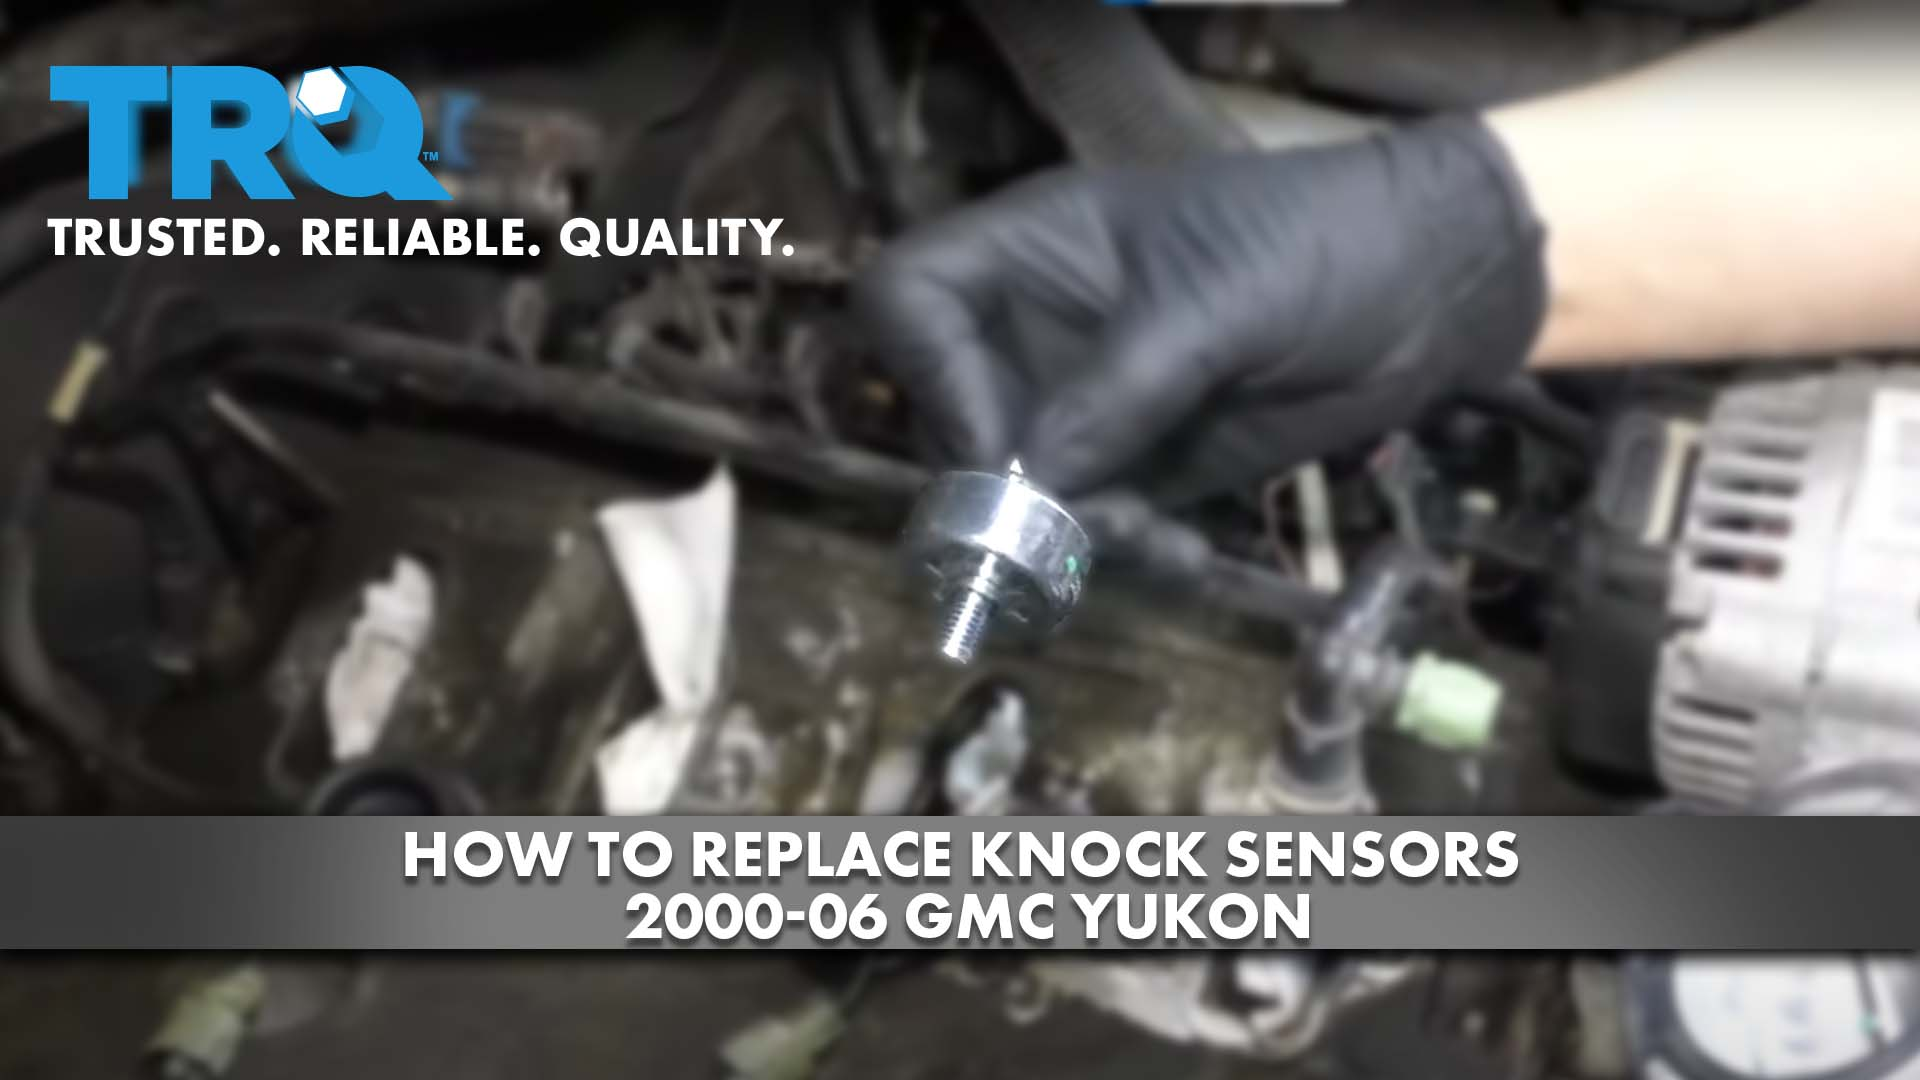 How to Replace Knock Sensors 2000-06 GMC Yukon